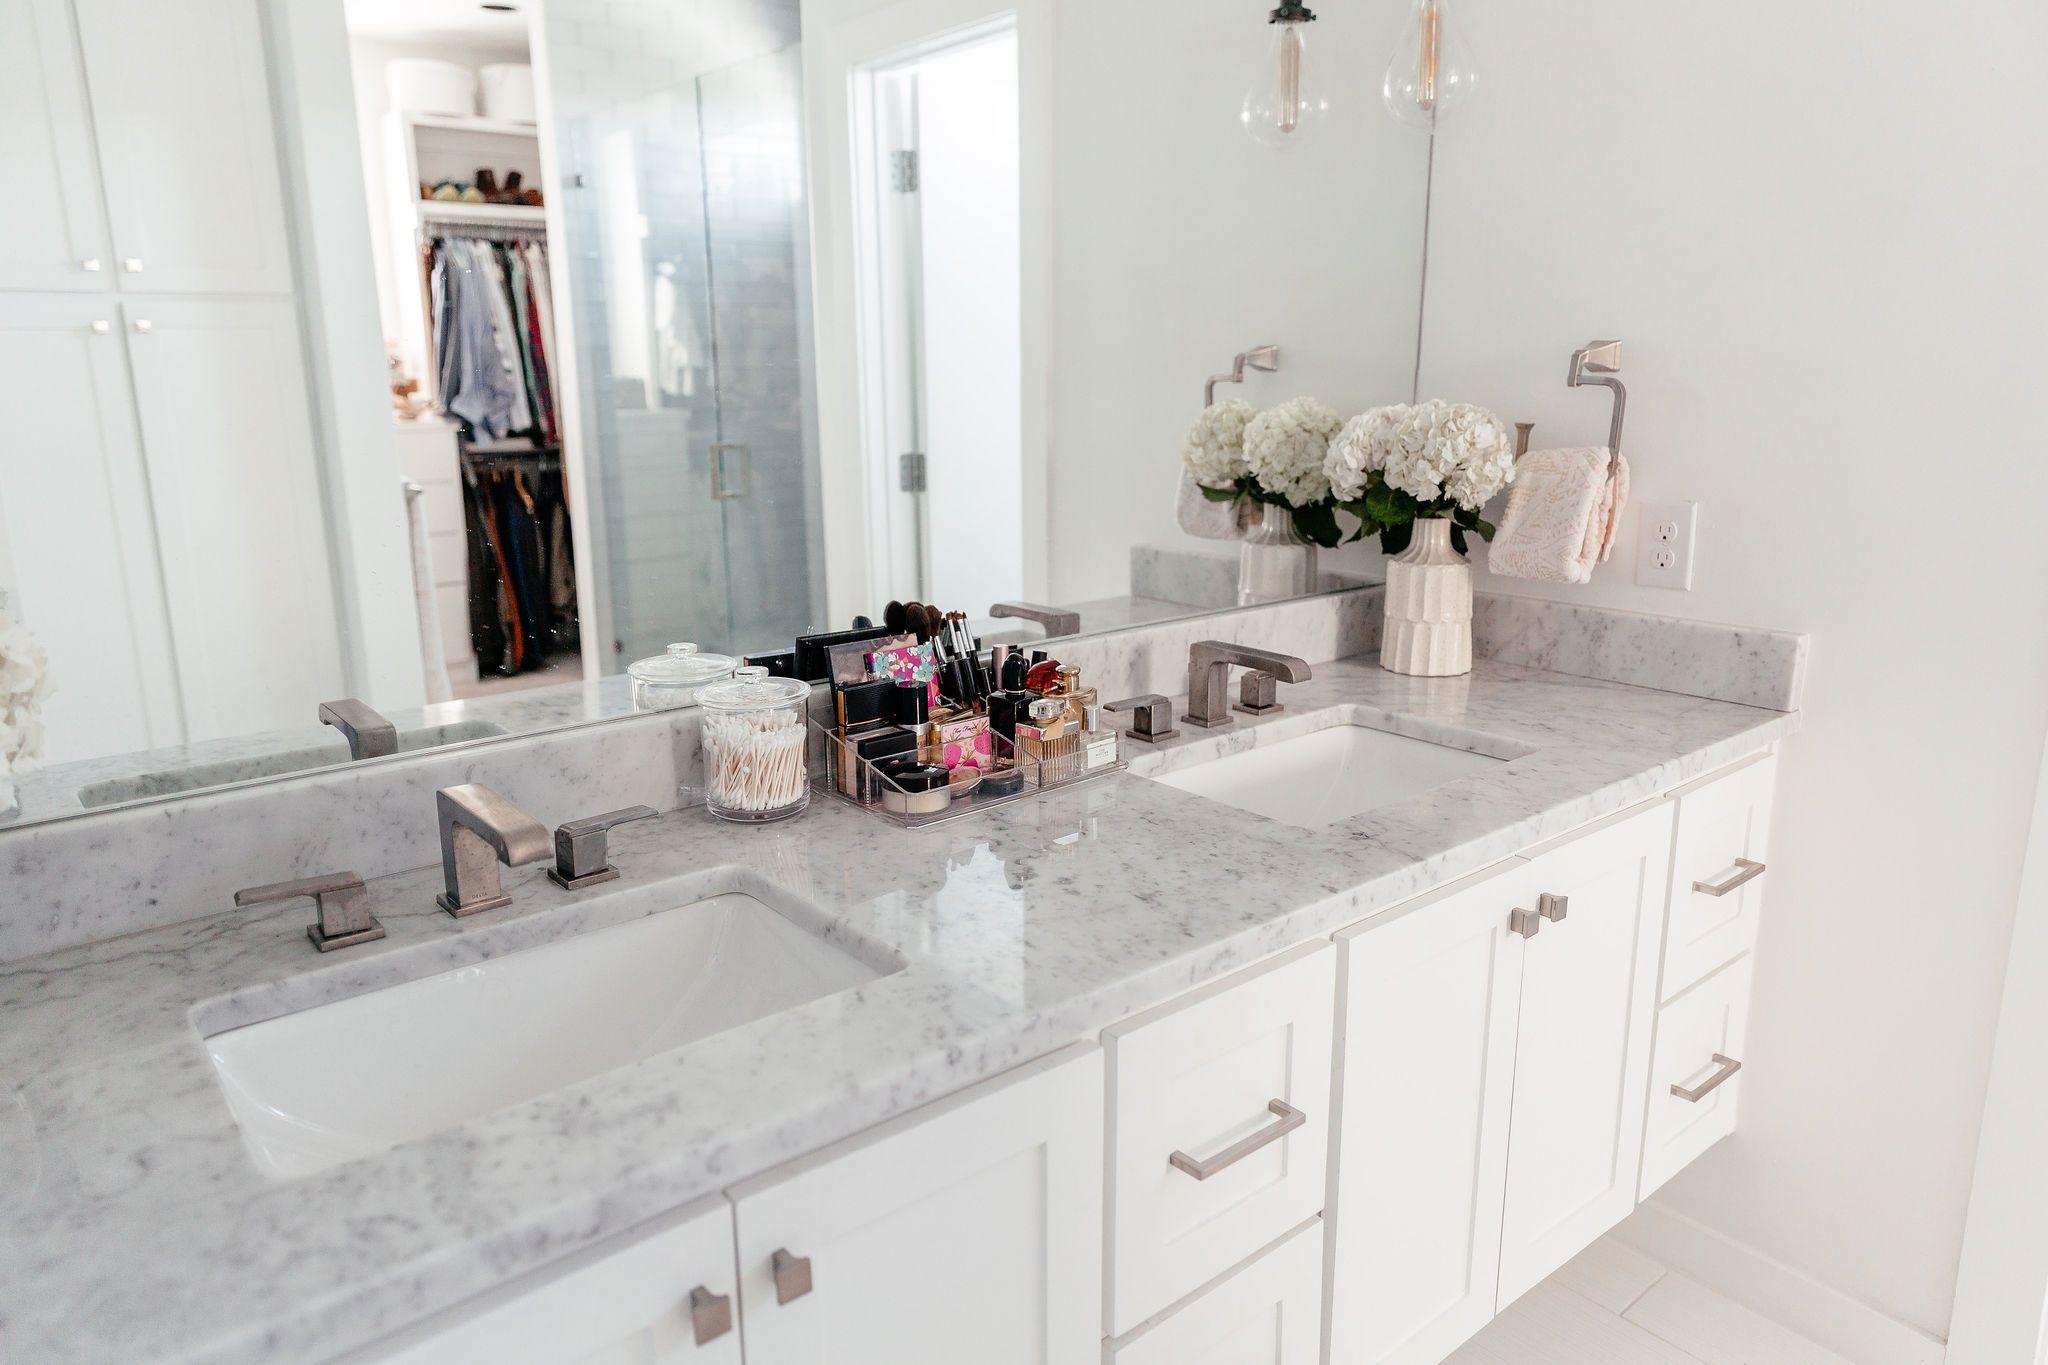 Bathroom Organization Tips With Images Bathroom Organization